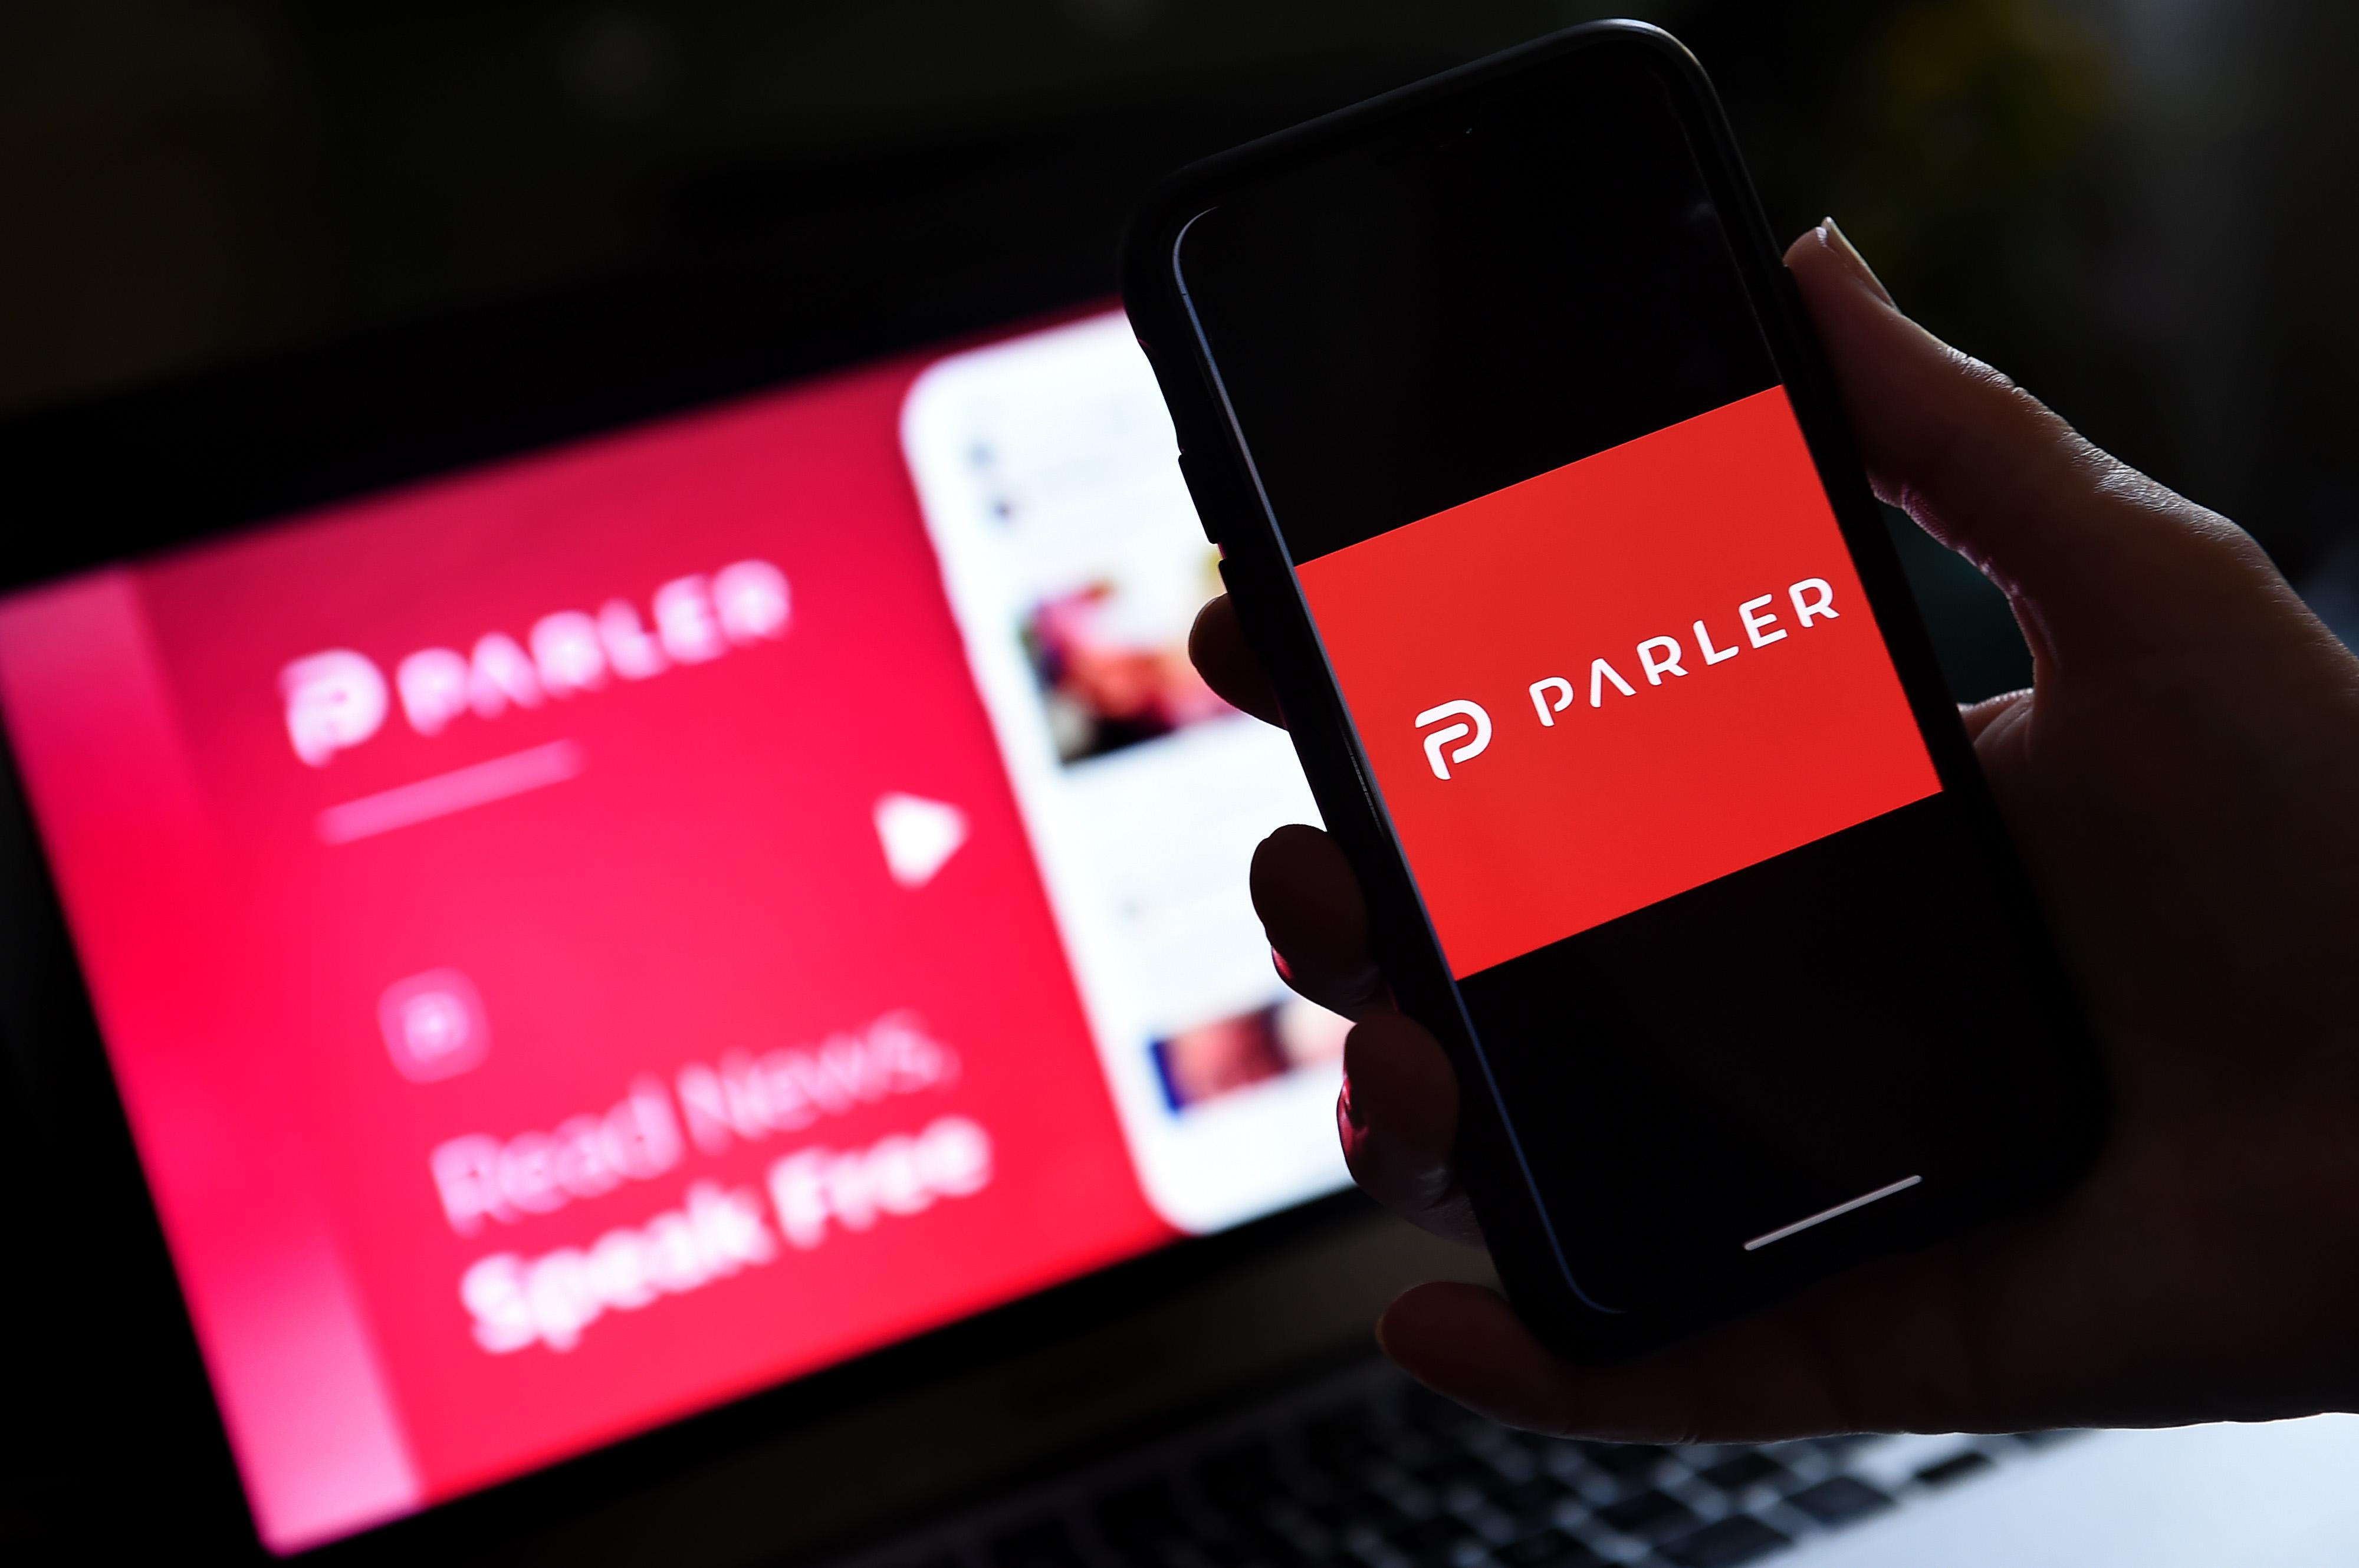 Social network Parler terminates CEO John Matze